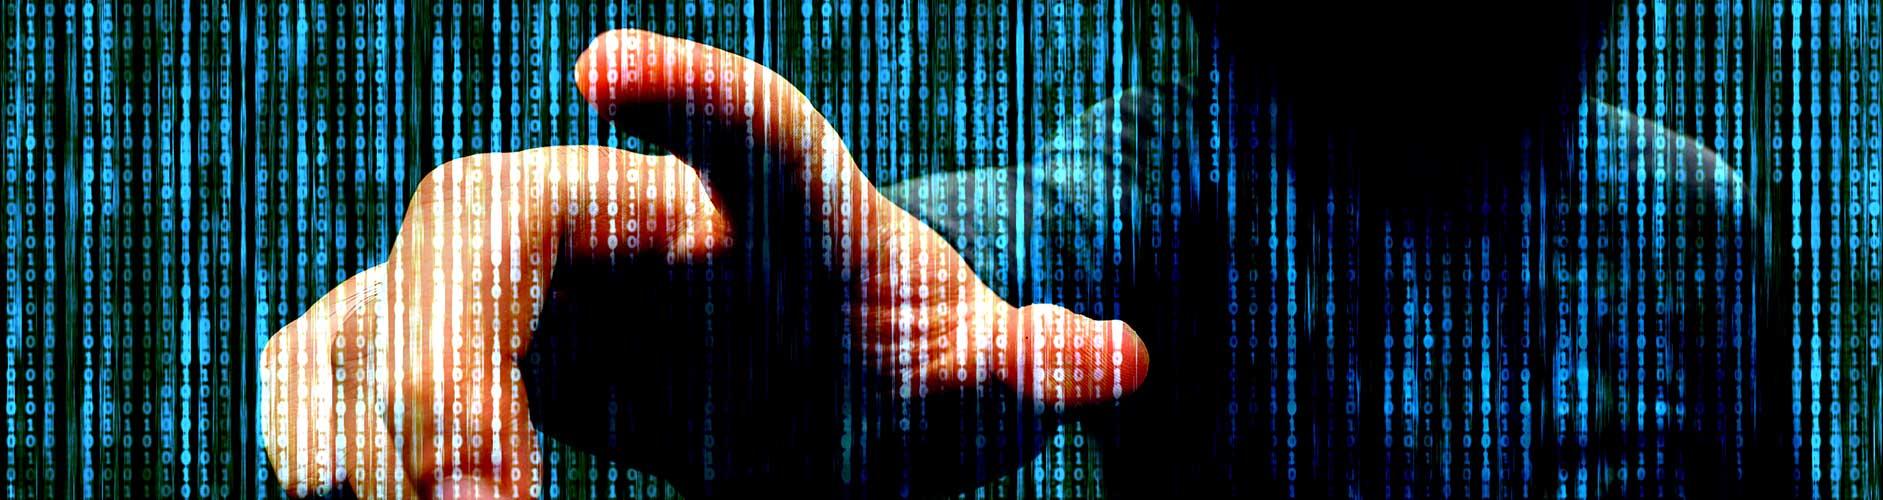 Are churches cyber crime's perfect victims?